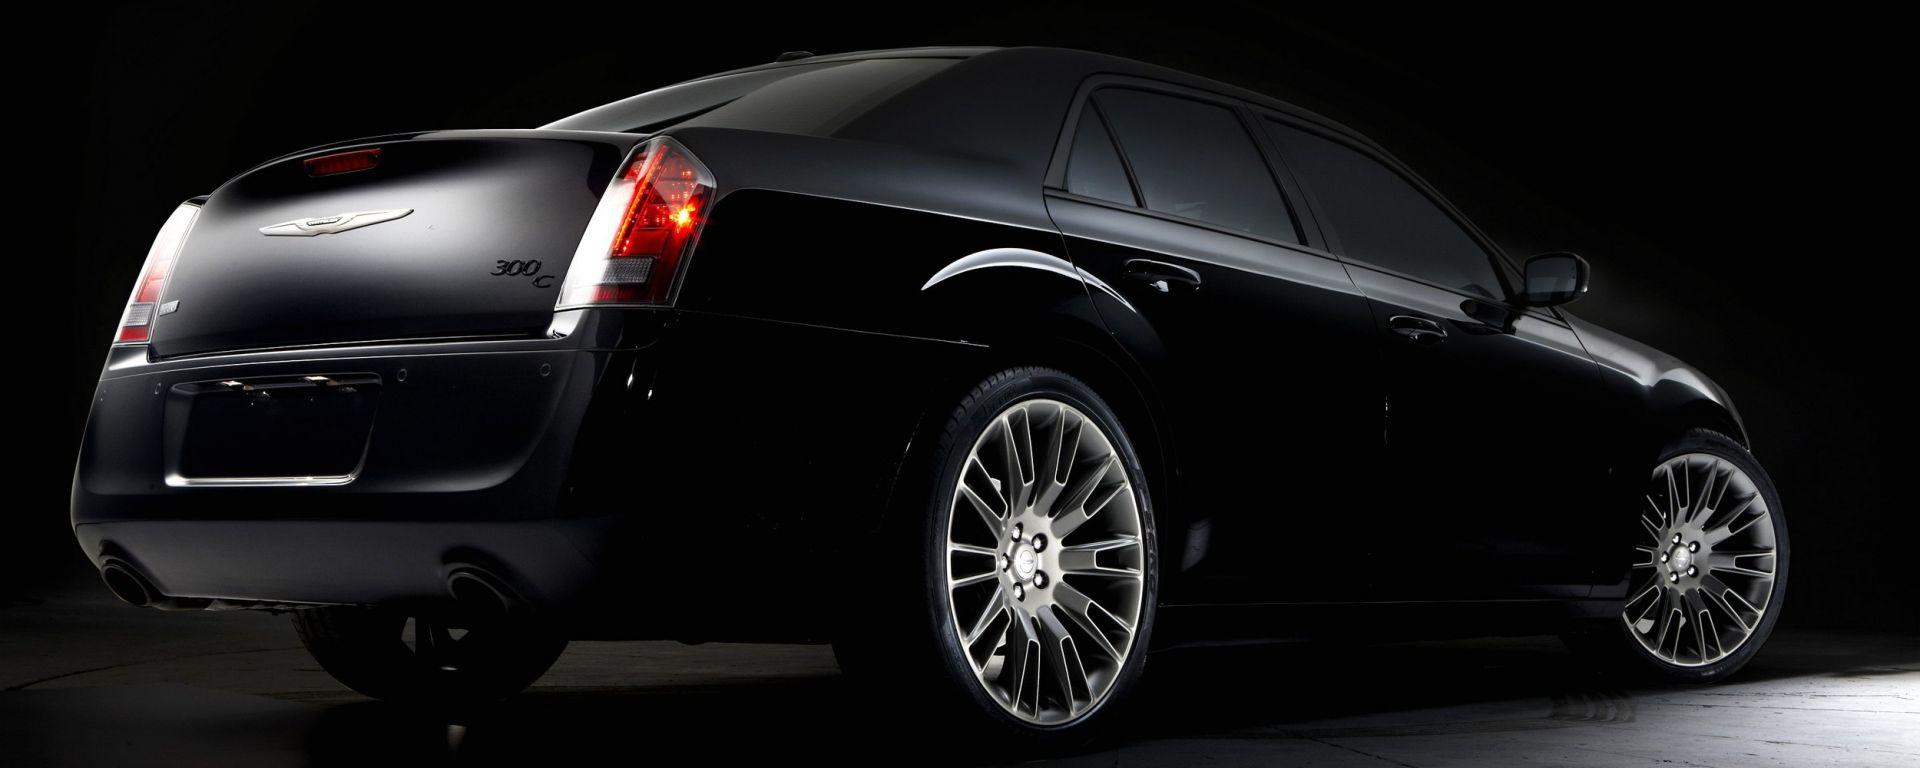 Chrysler 300C John Varvatos Limited Edition